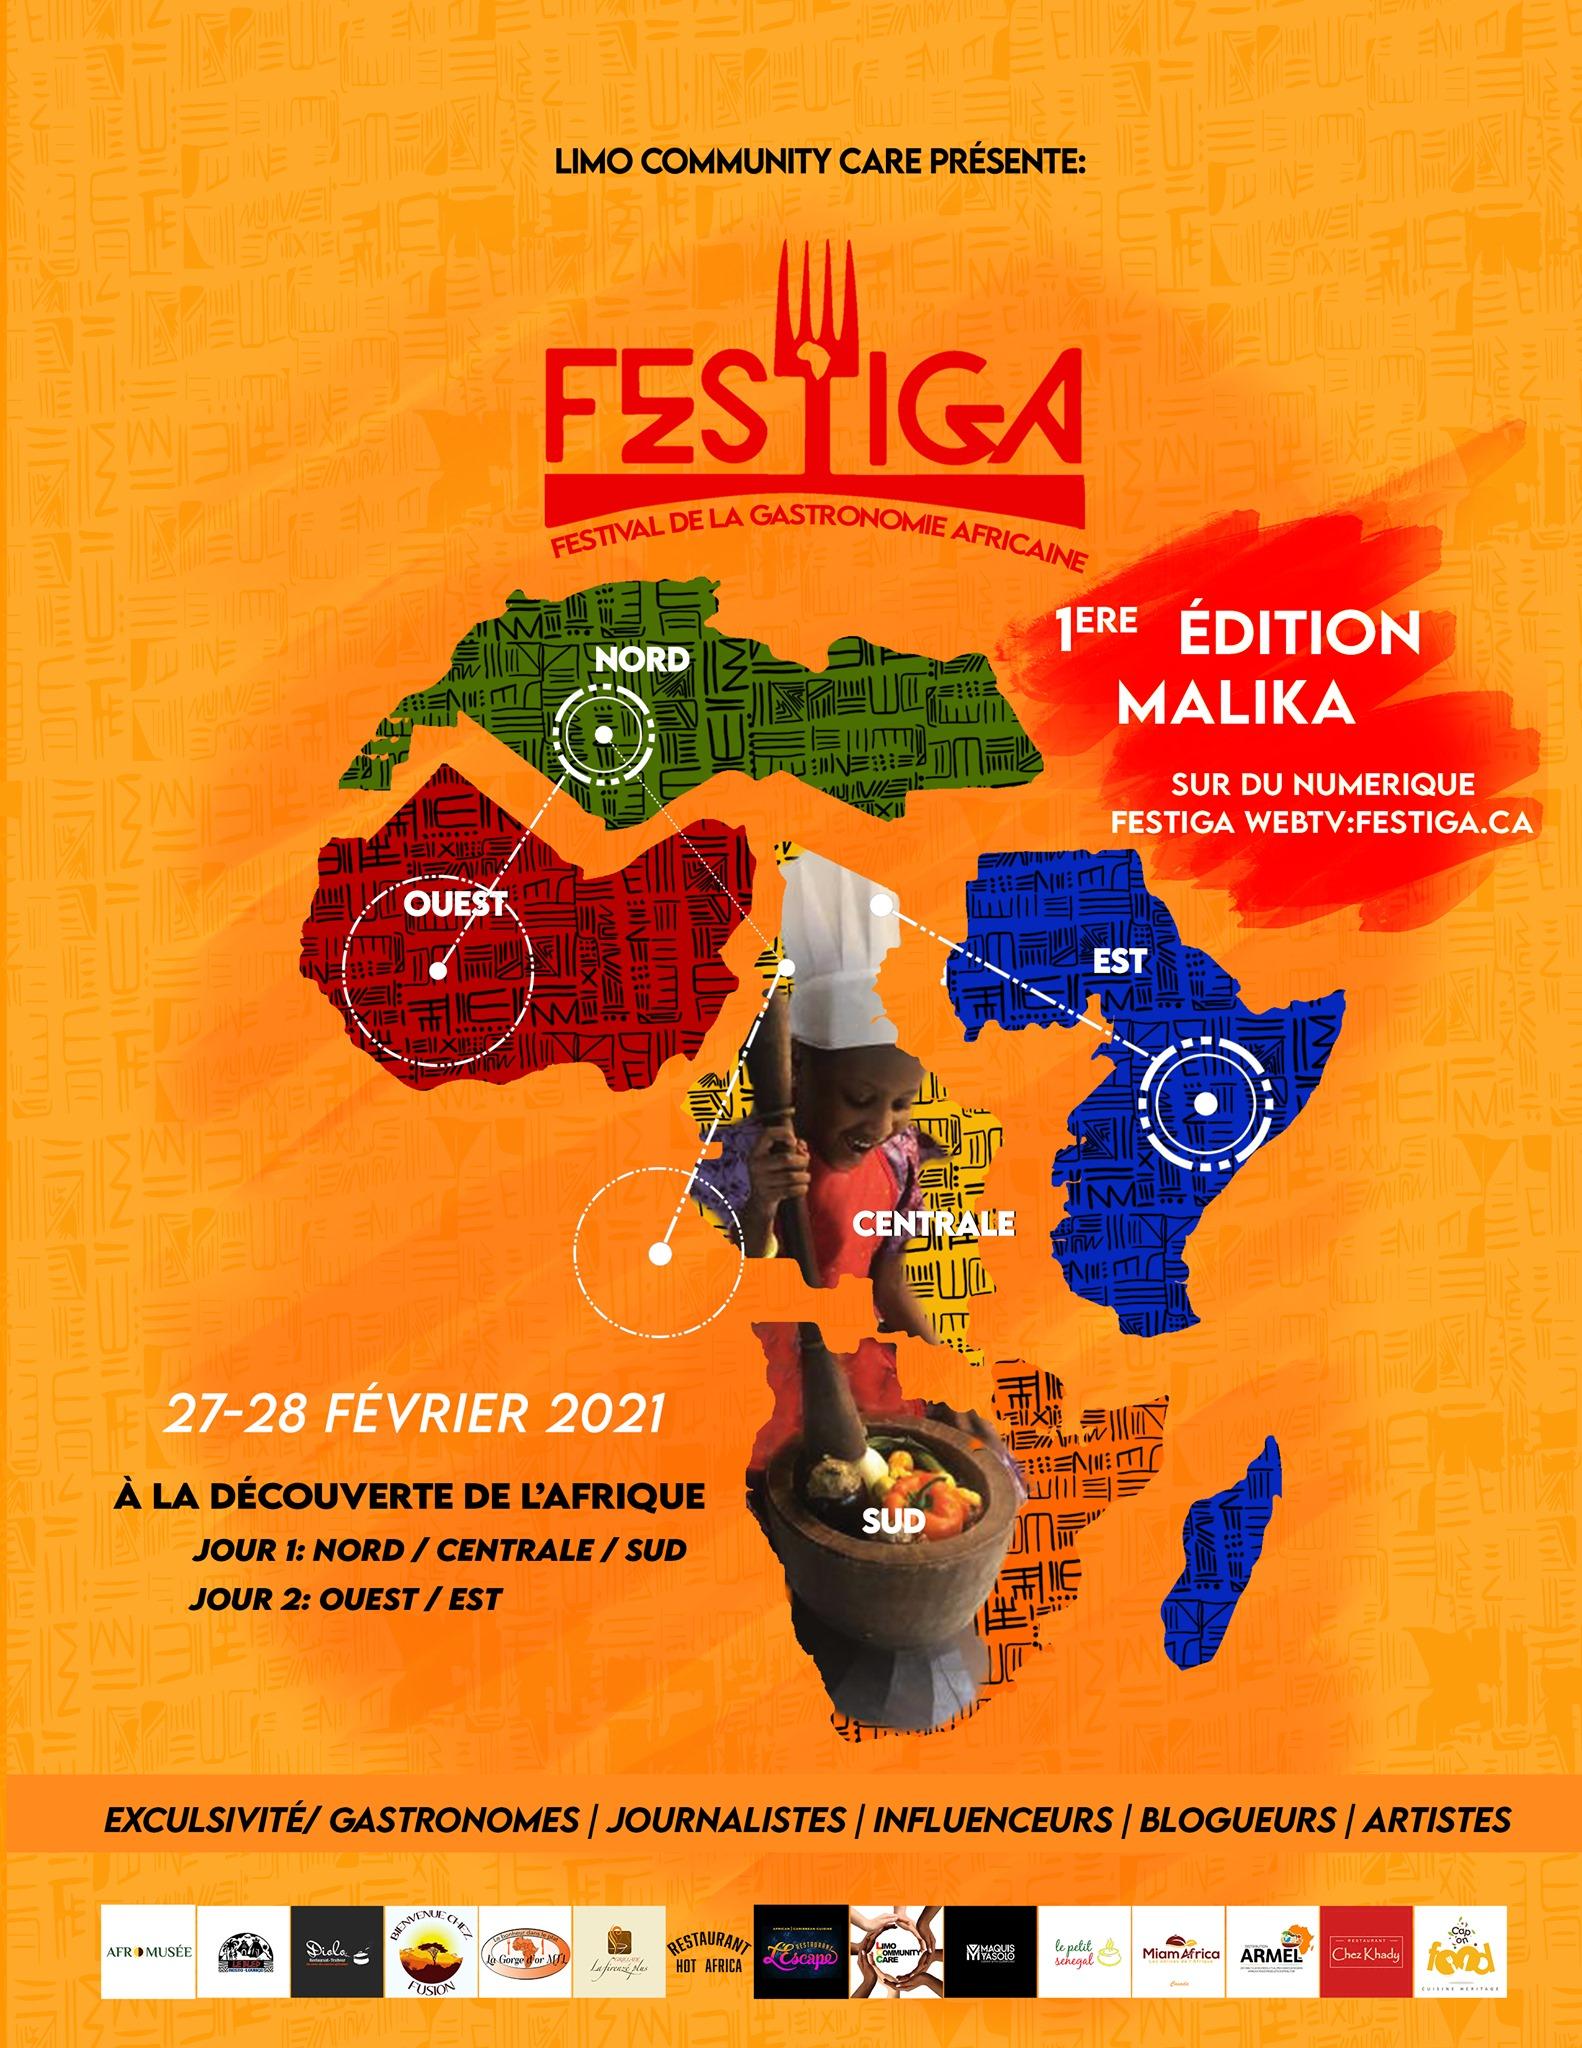 FESTIGA (FESTIVAL DE LA GASTRONOMIE AFRICAINE)